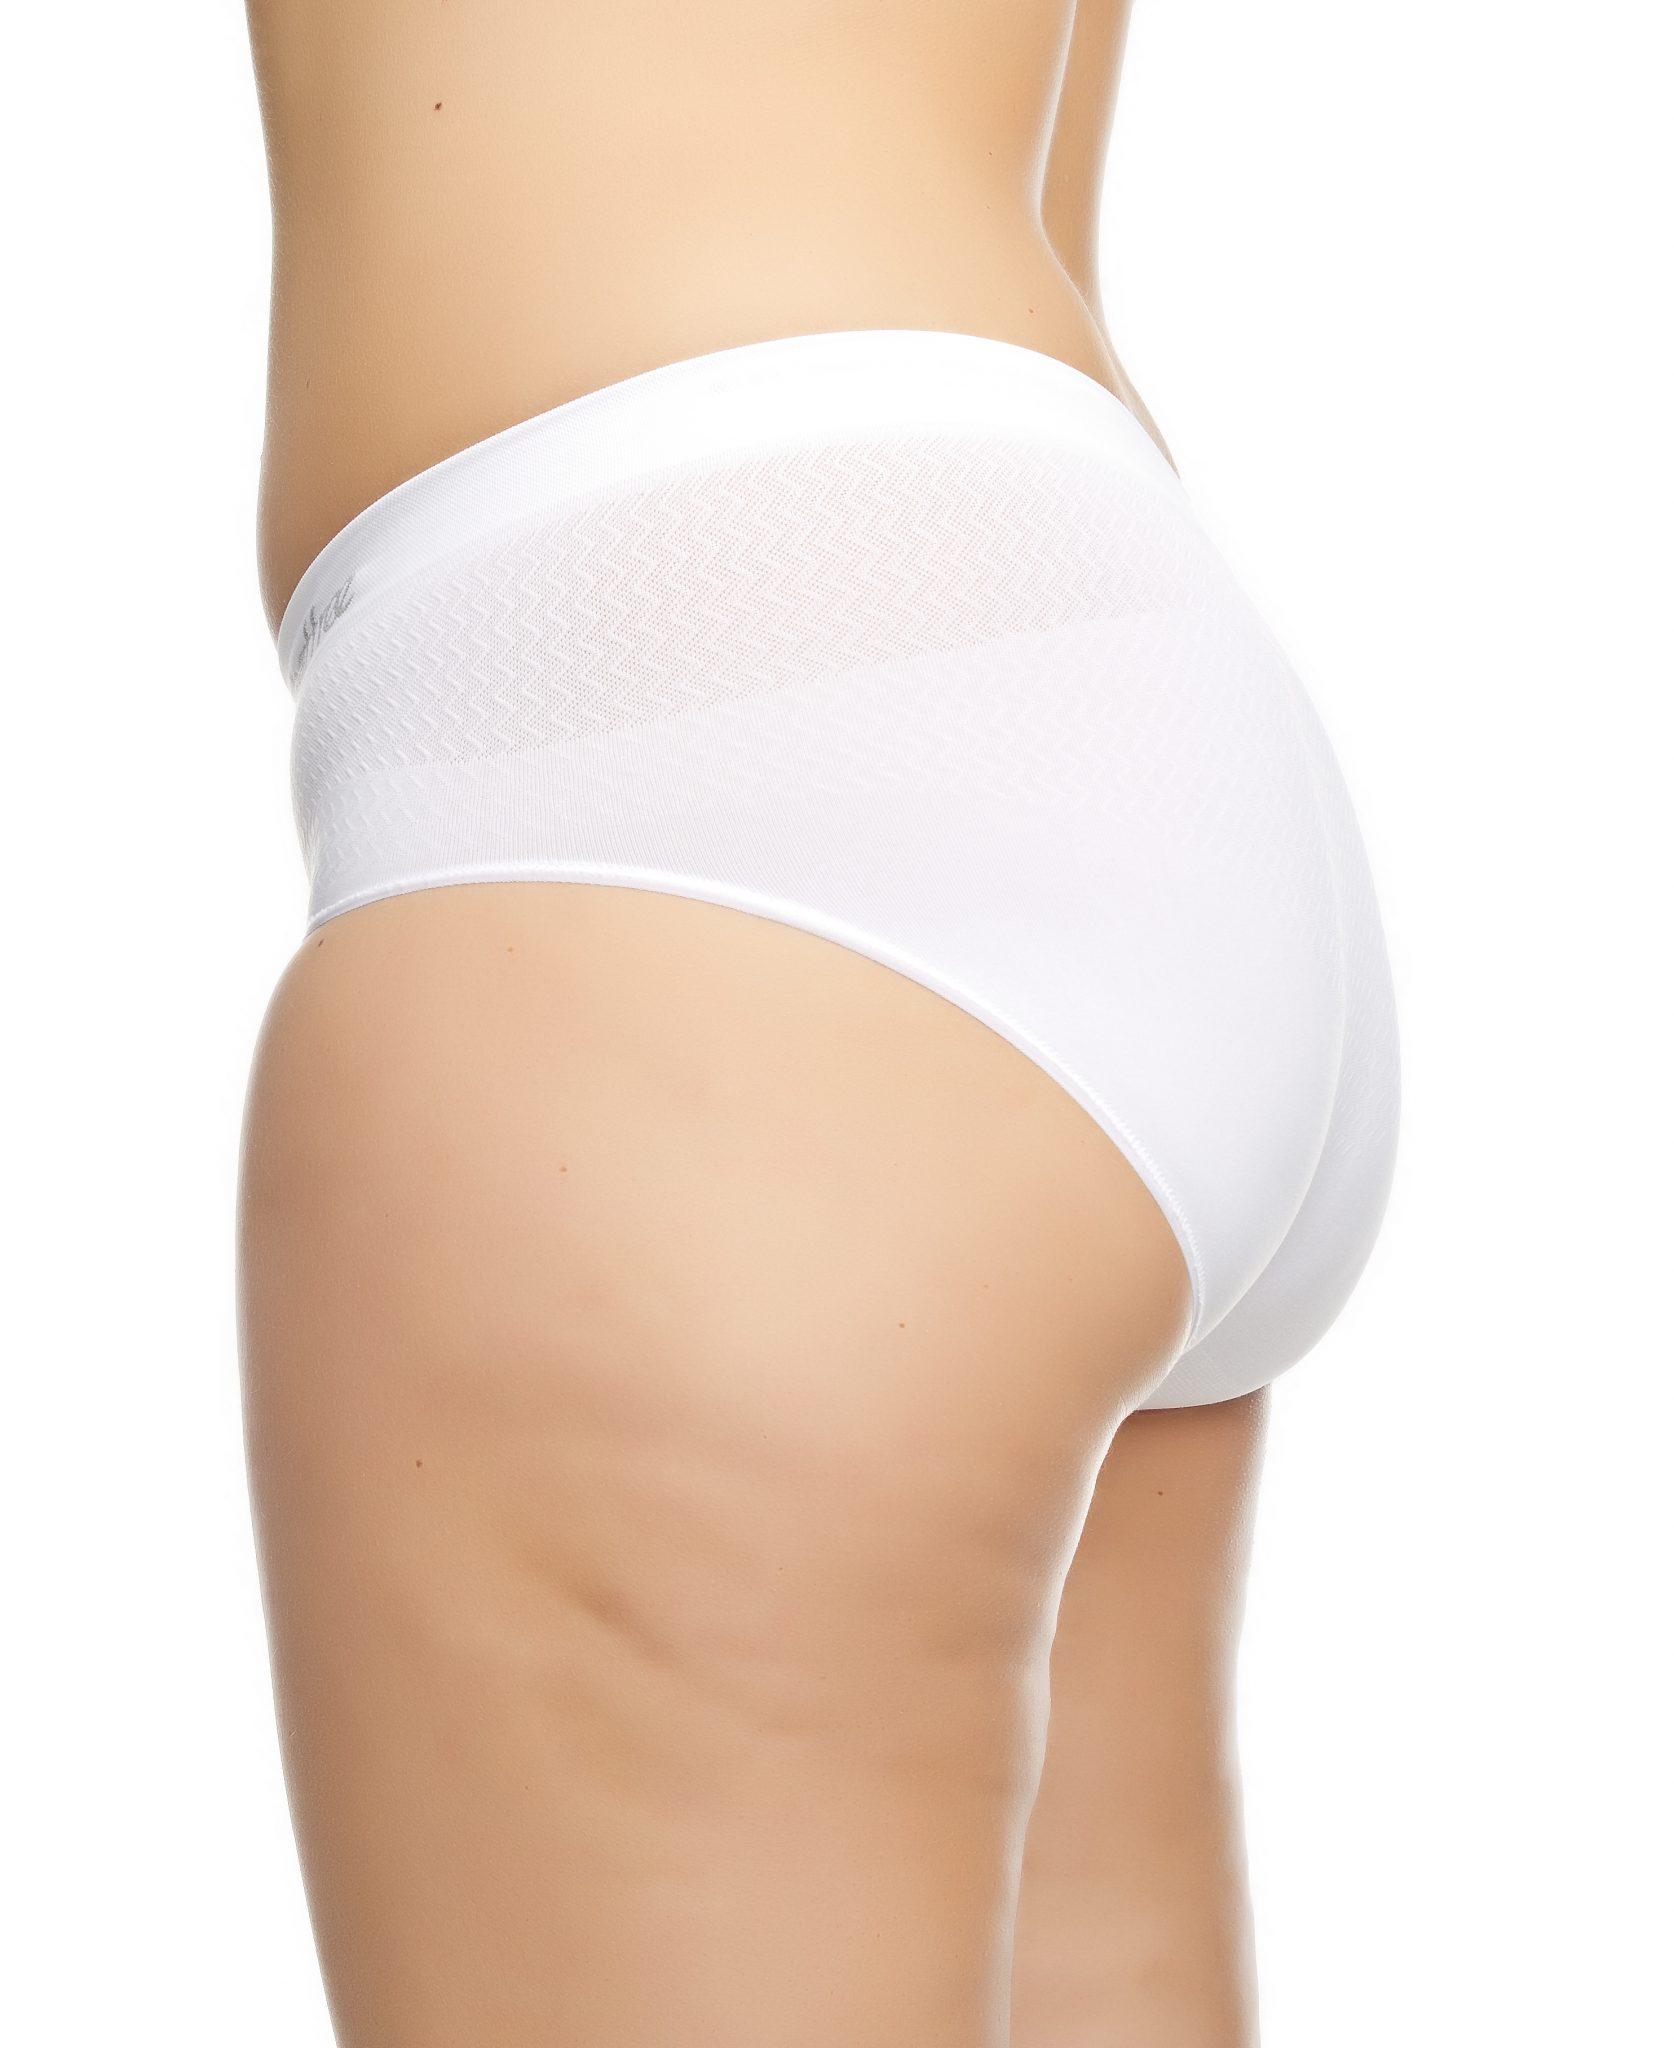 chaffree white midi waist briefs